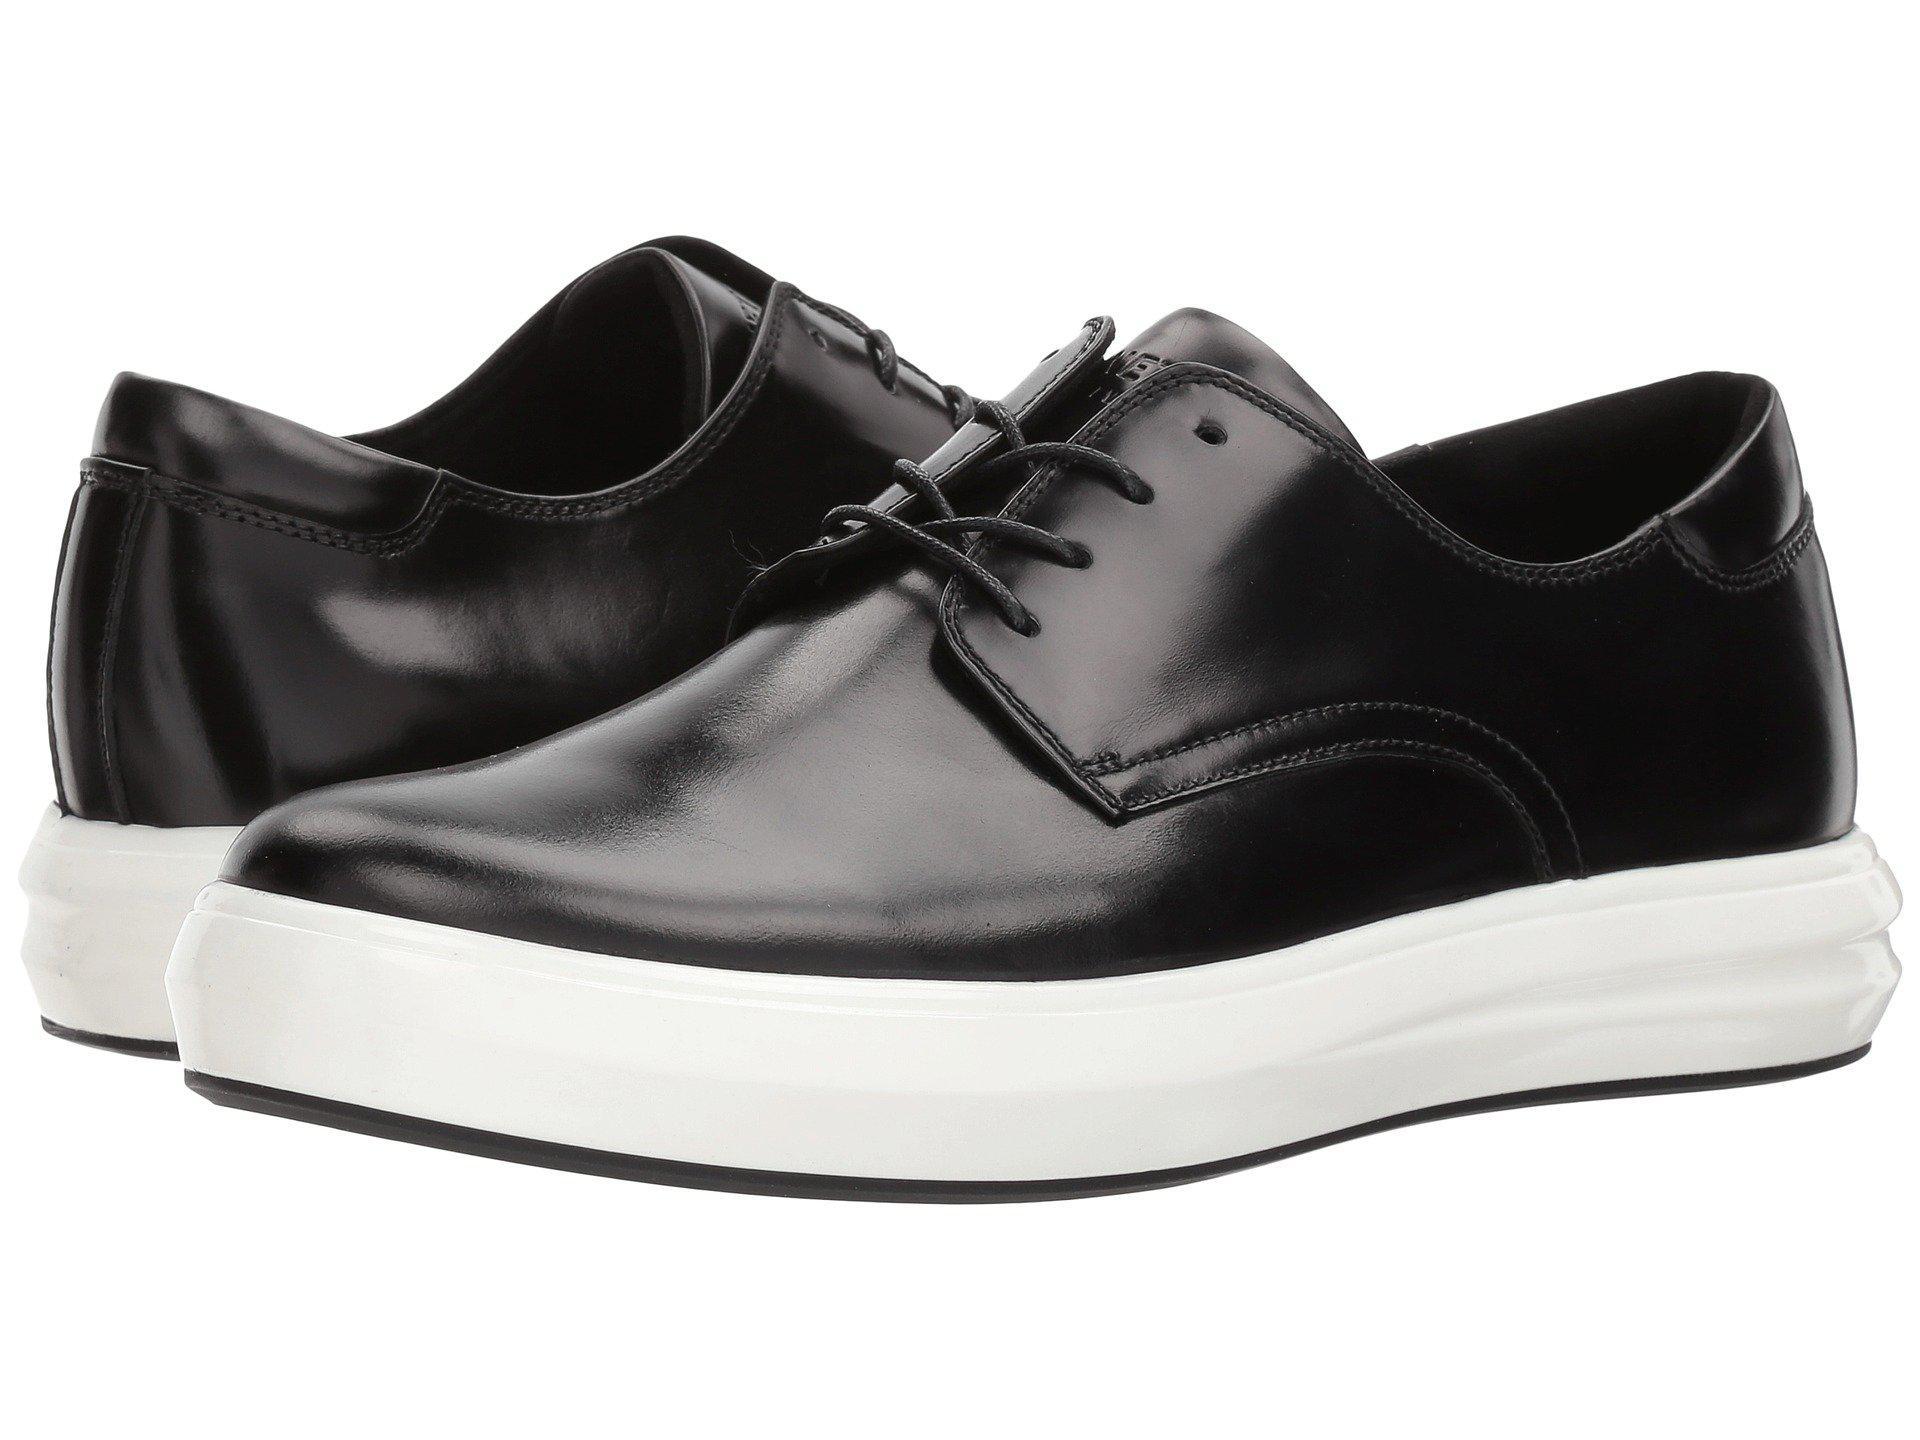 Kenneth Cole New York Design 112075 Sneaker